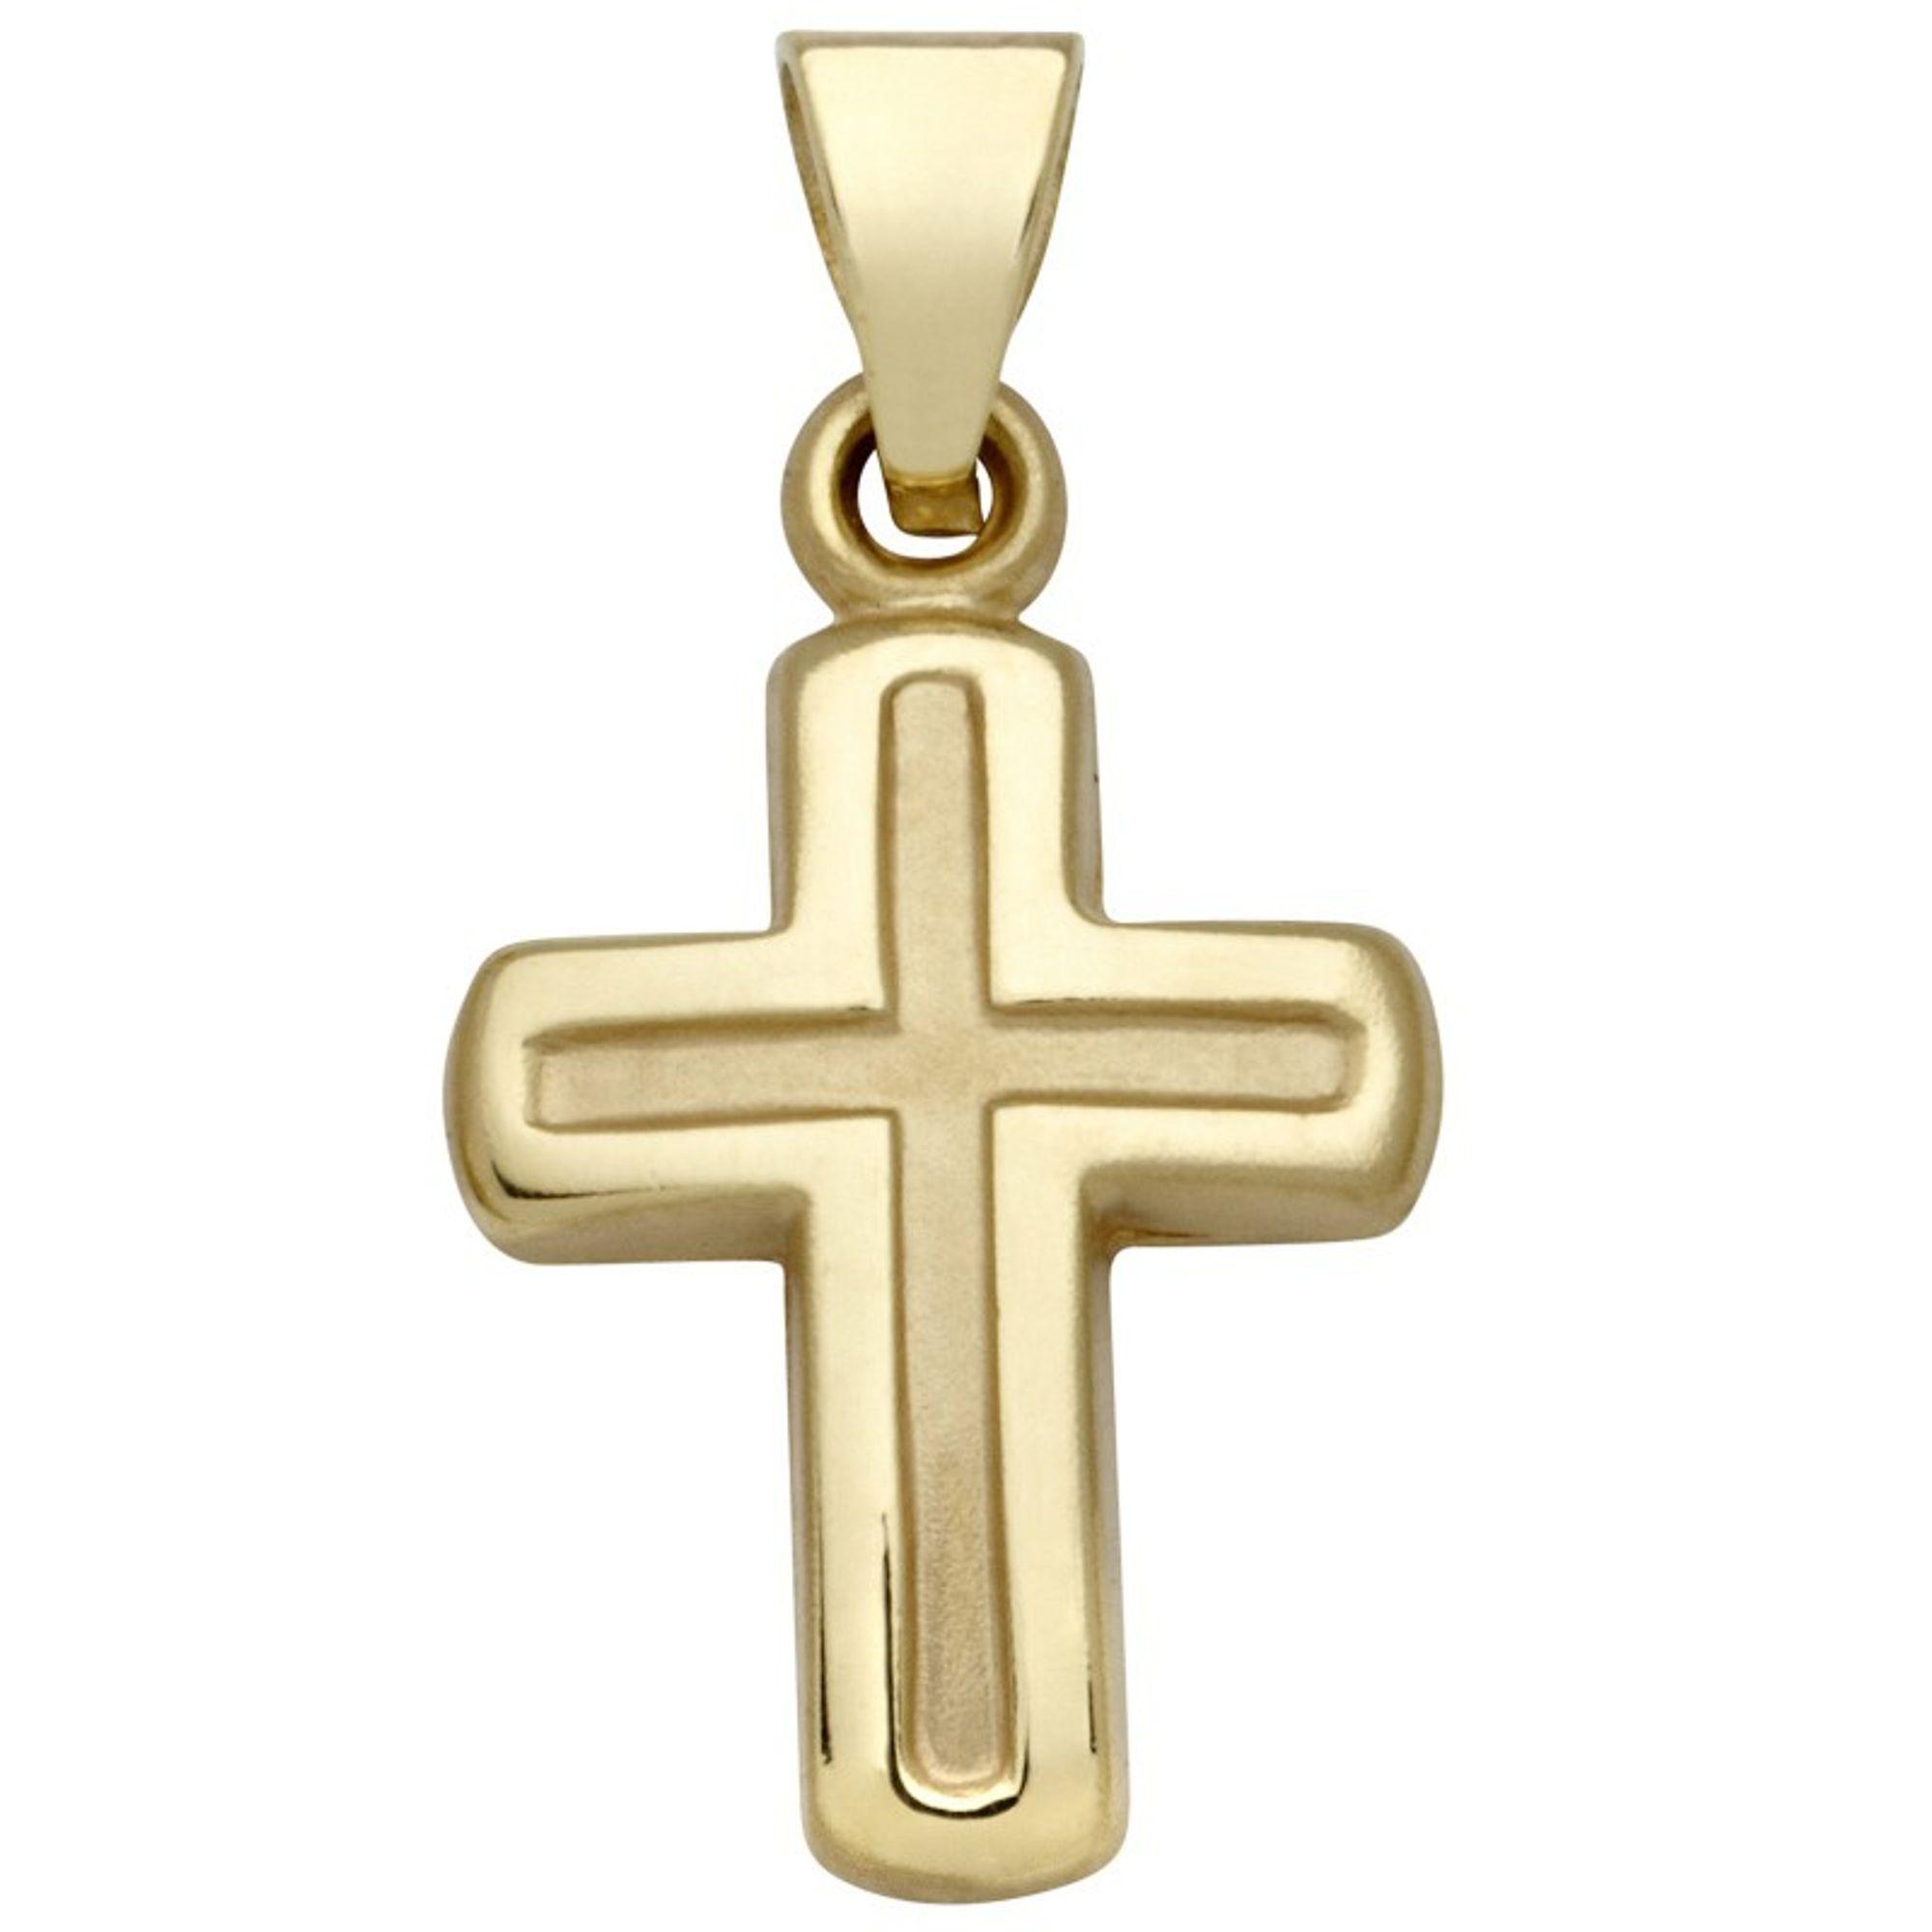 Basic Gold K29 Kinder Anhänger Kreuz 14 Karat (585) Gelbgold